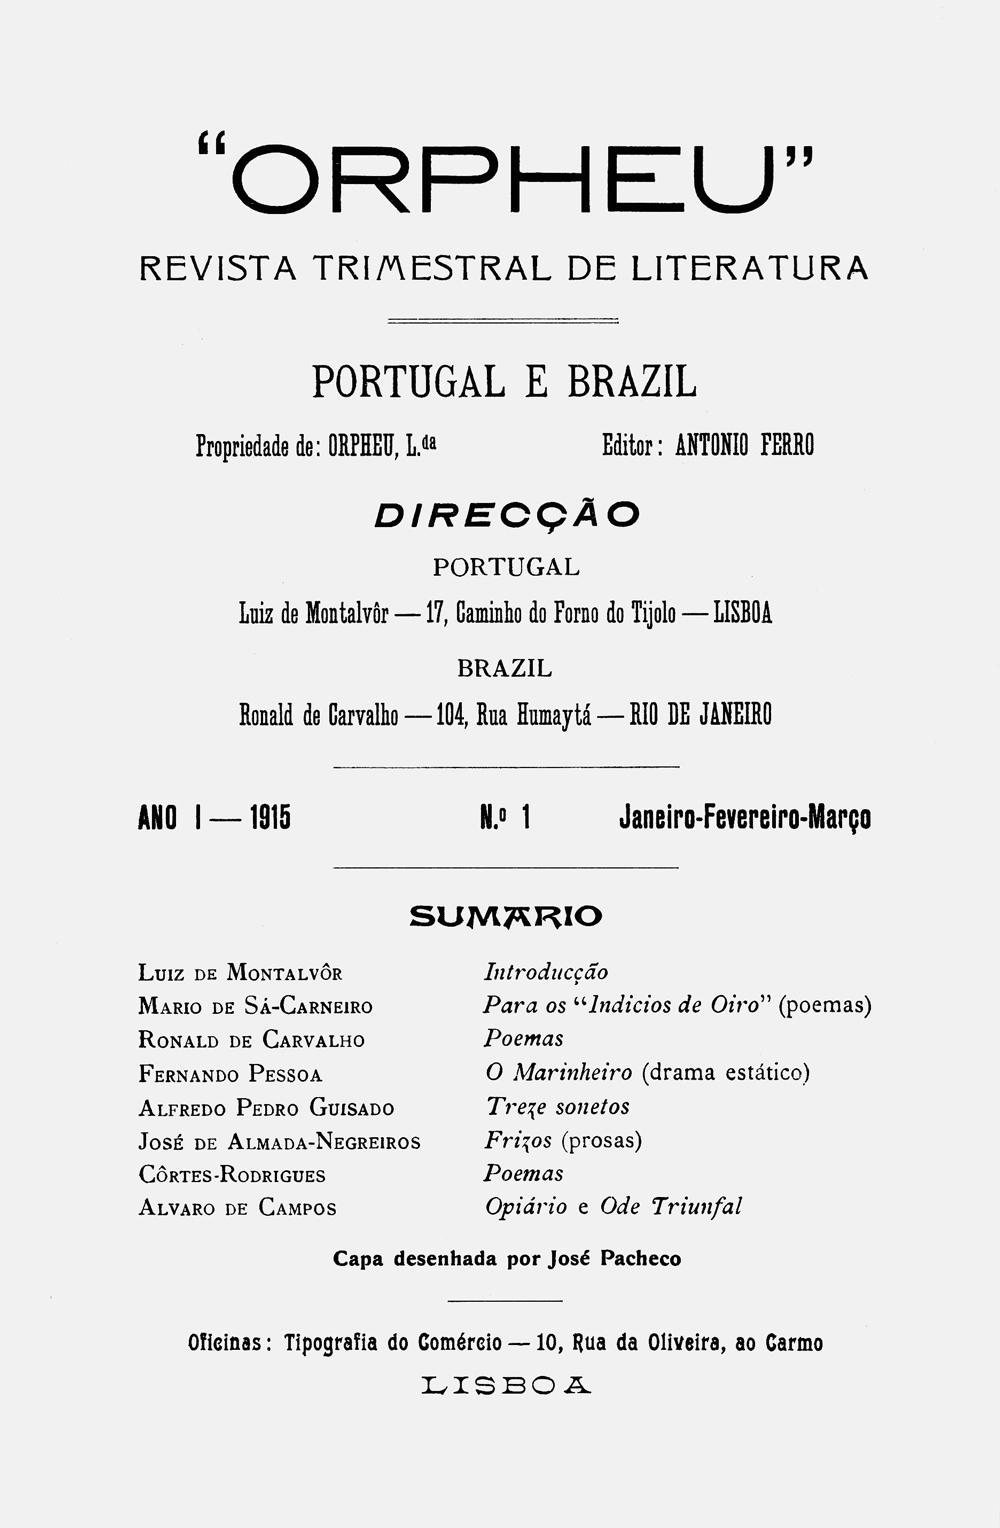 100anosorpheu_1915